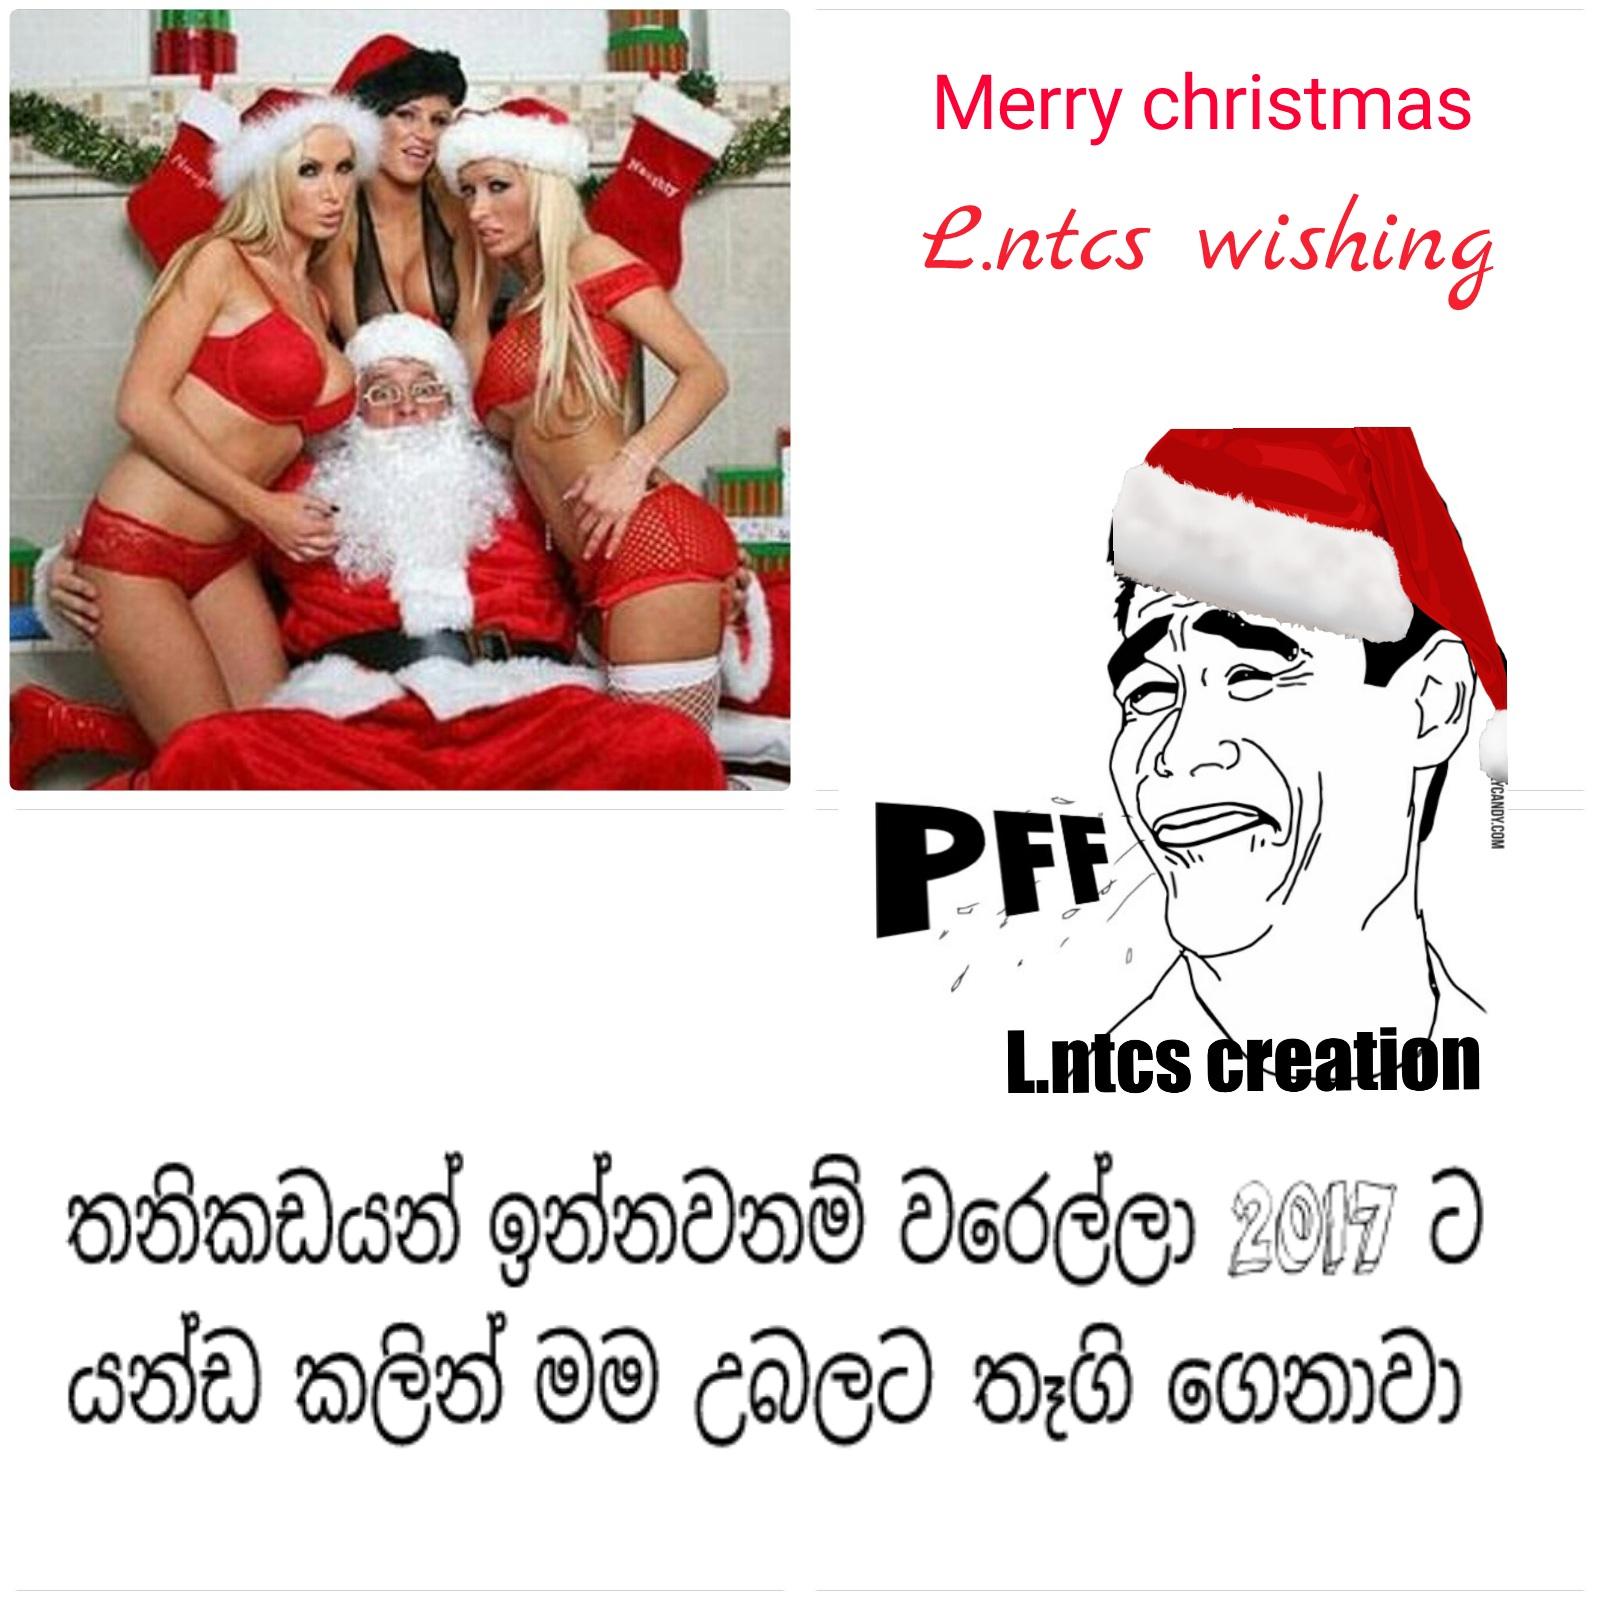 lakshanntcs : lakshan ntcs jokes creations - christmas joke